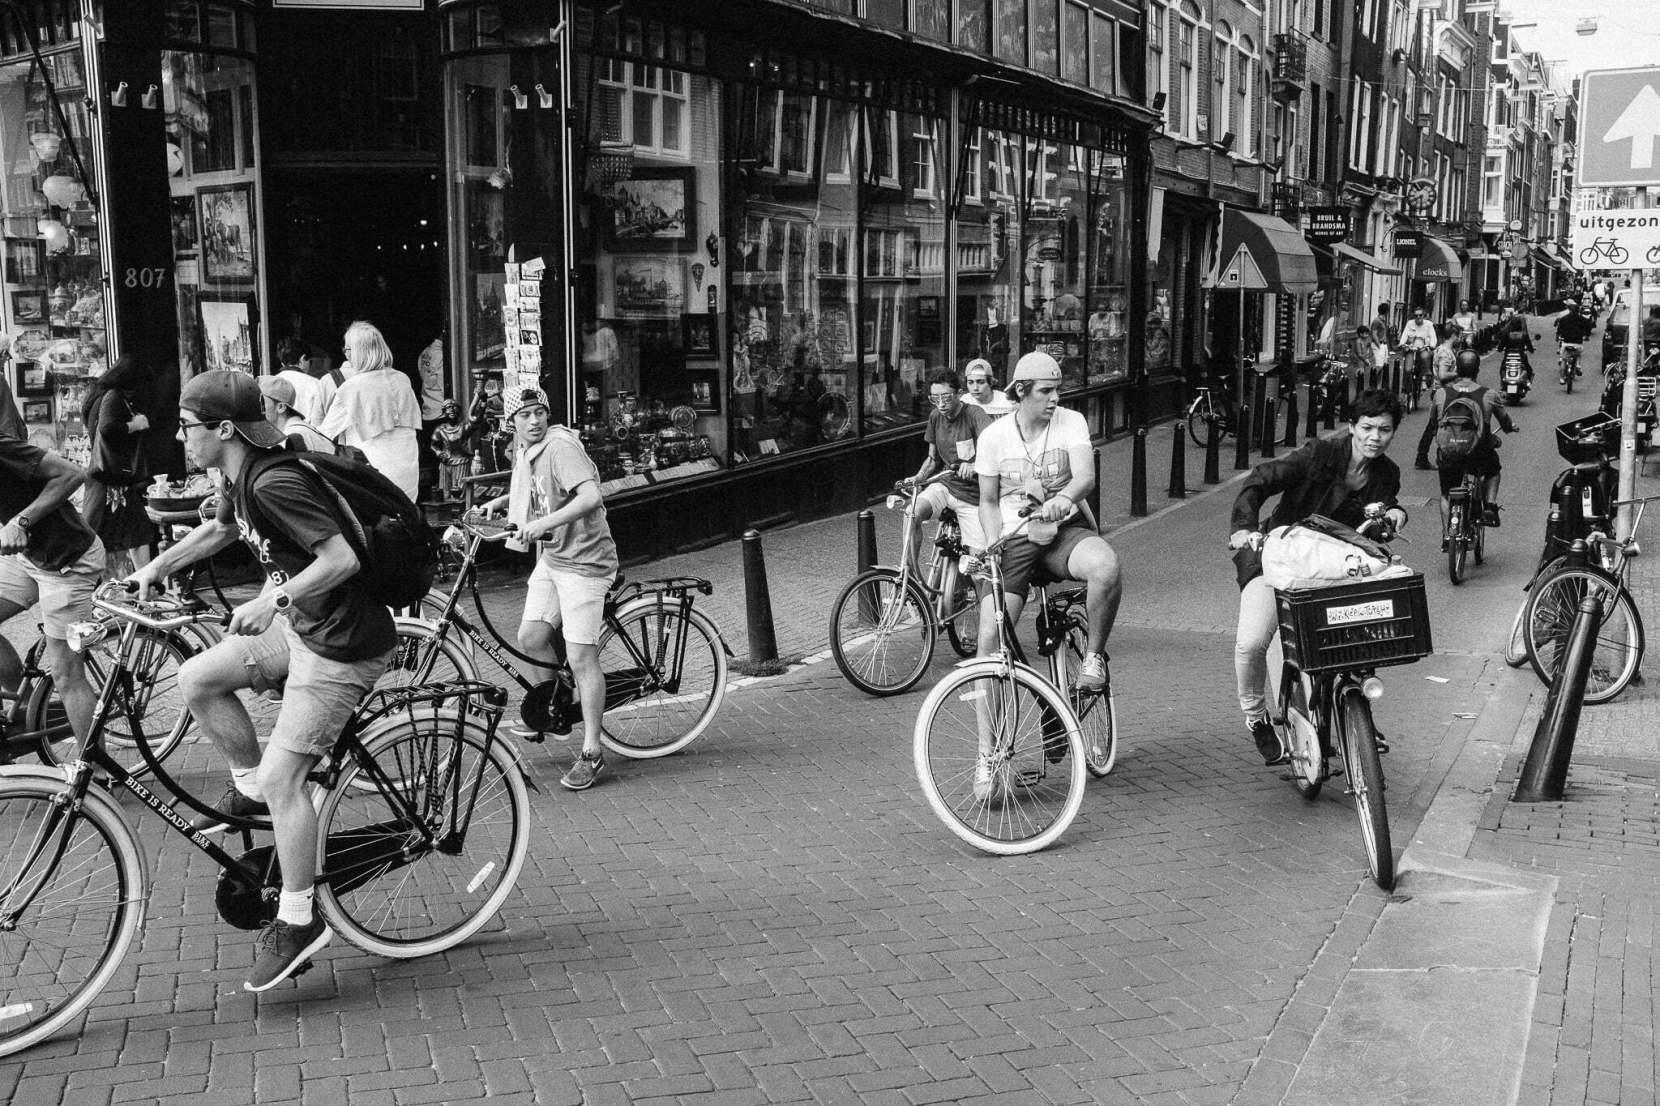 amsterdam-6709-pete-carr